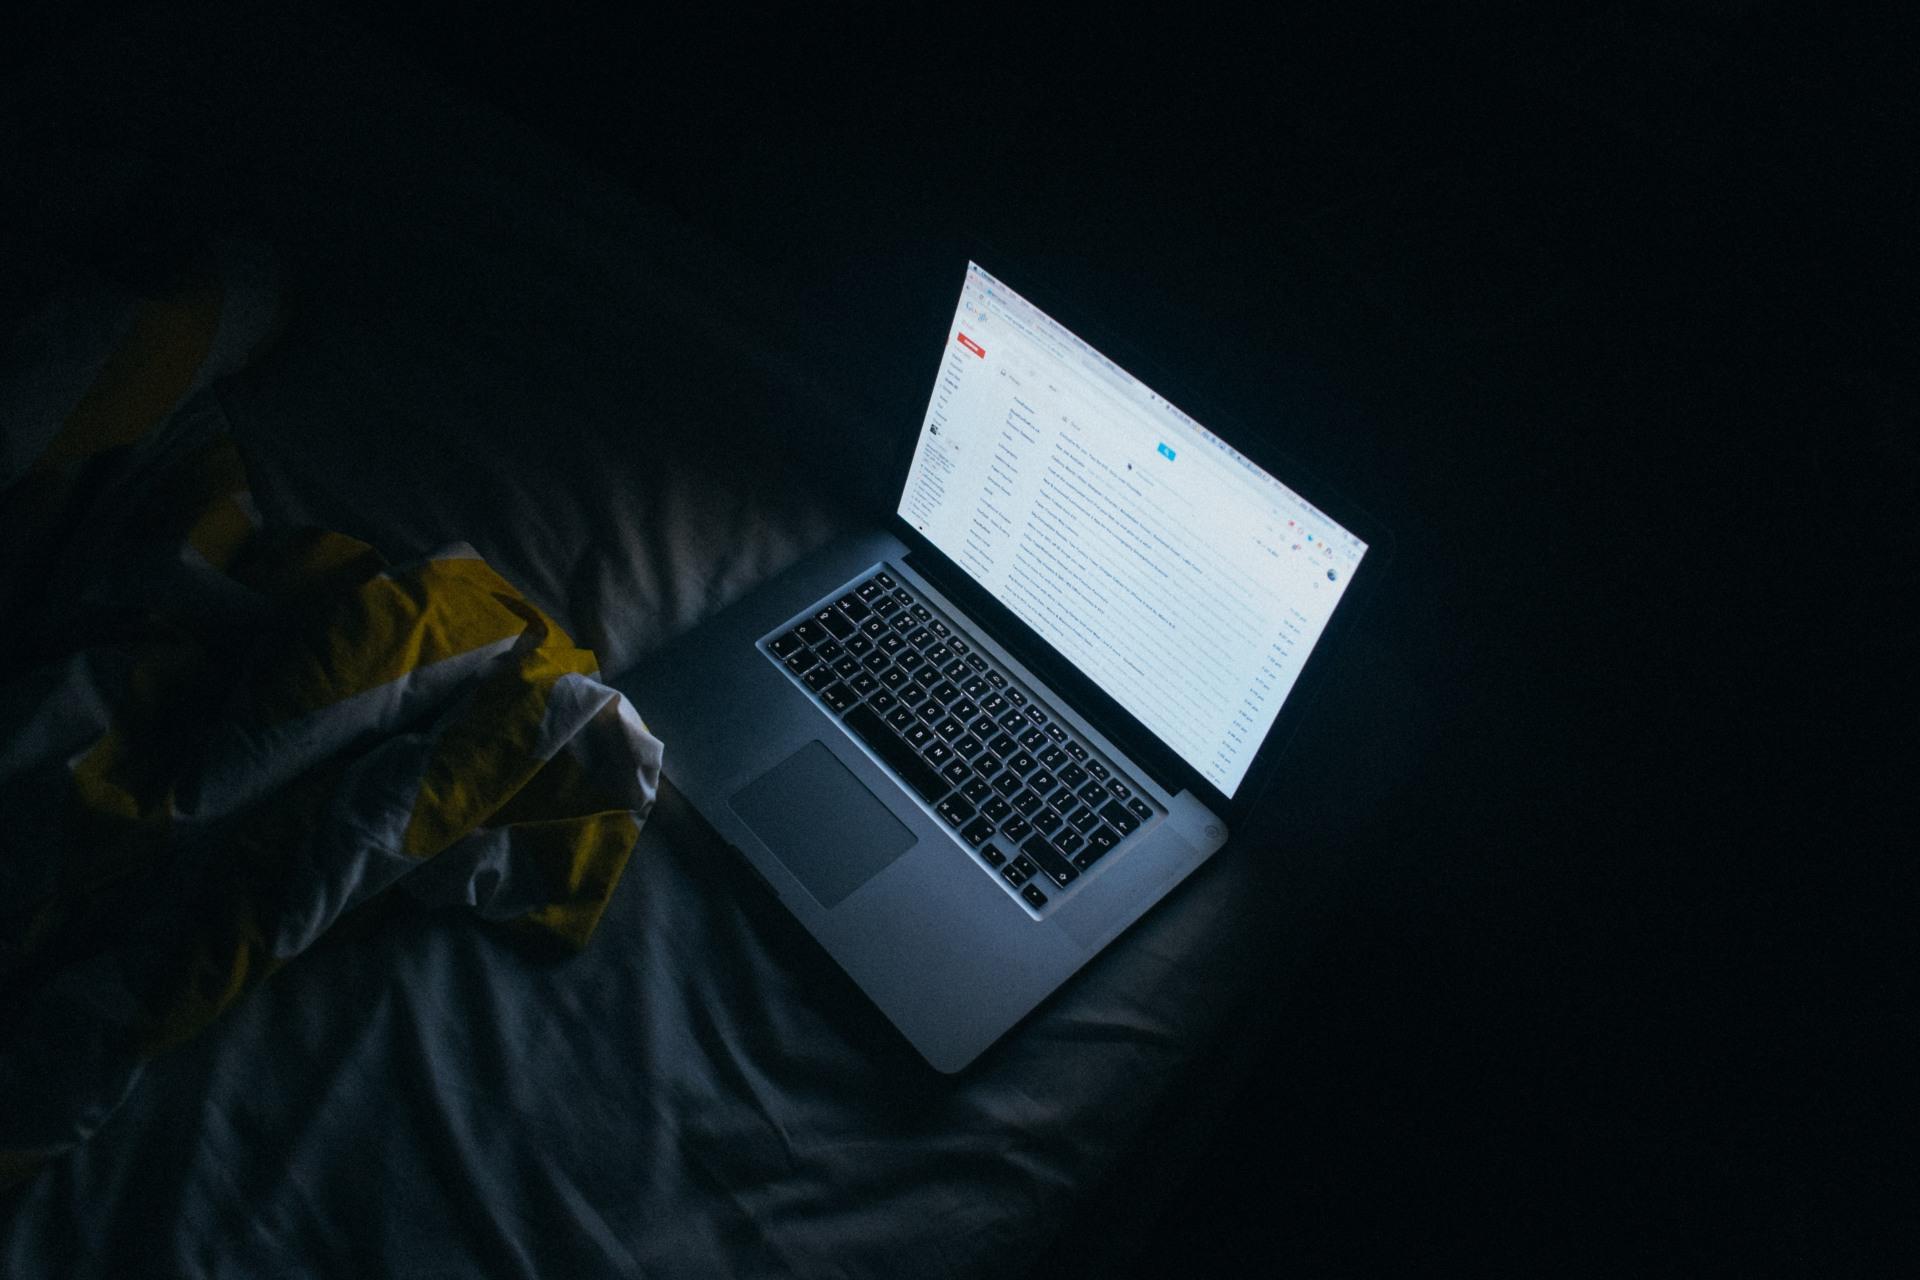 Gmail Macbook Apple Blog Pedro Topete Portugal